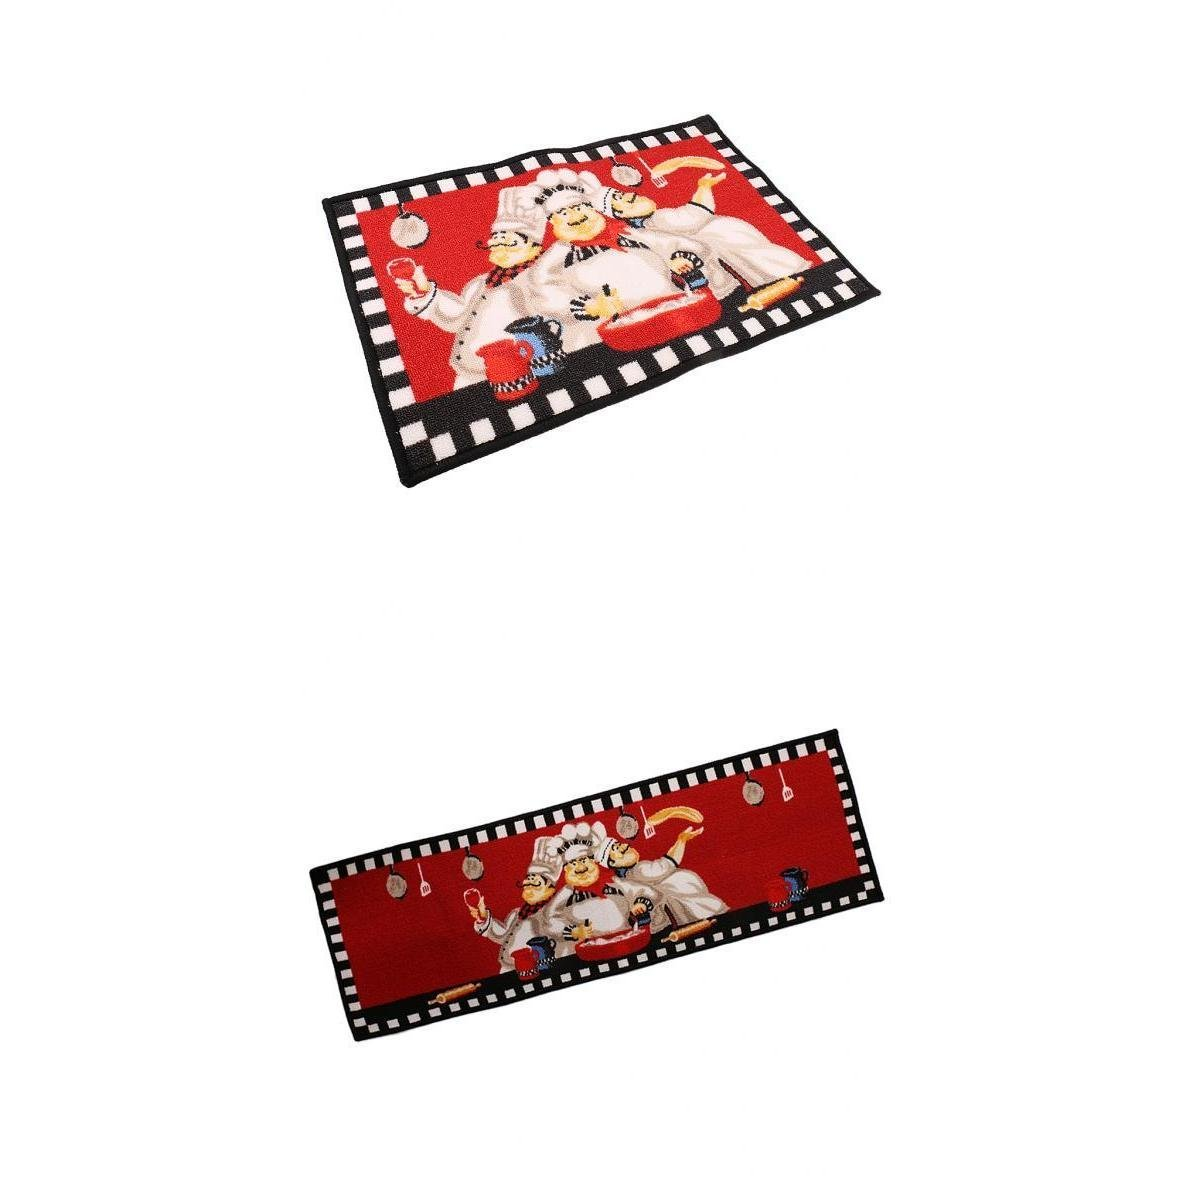 D DOLITY Dining Room Mat Runner Machine Washable Floor Carpet Kitchen Rug Mats-Chef Pattern (40x60cm+ 40x120cm)